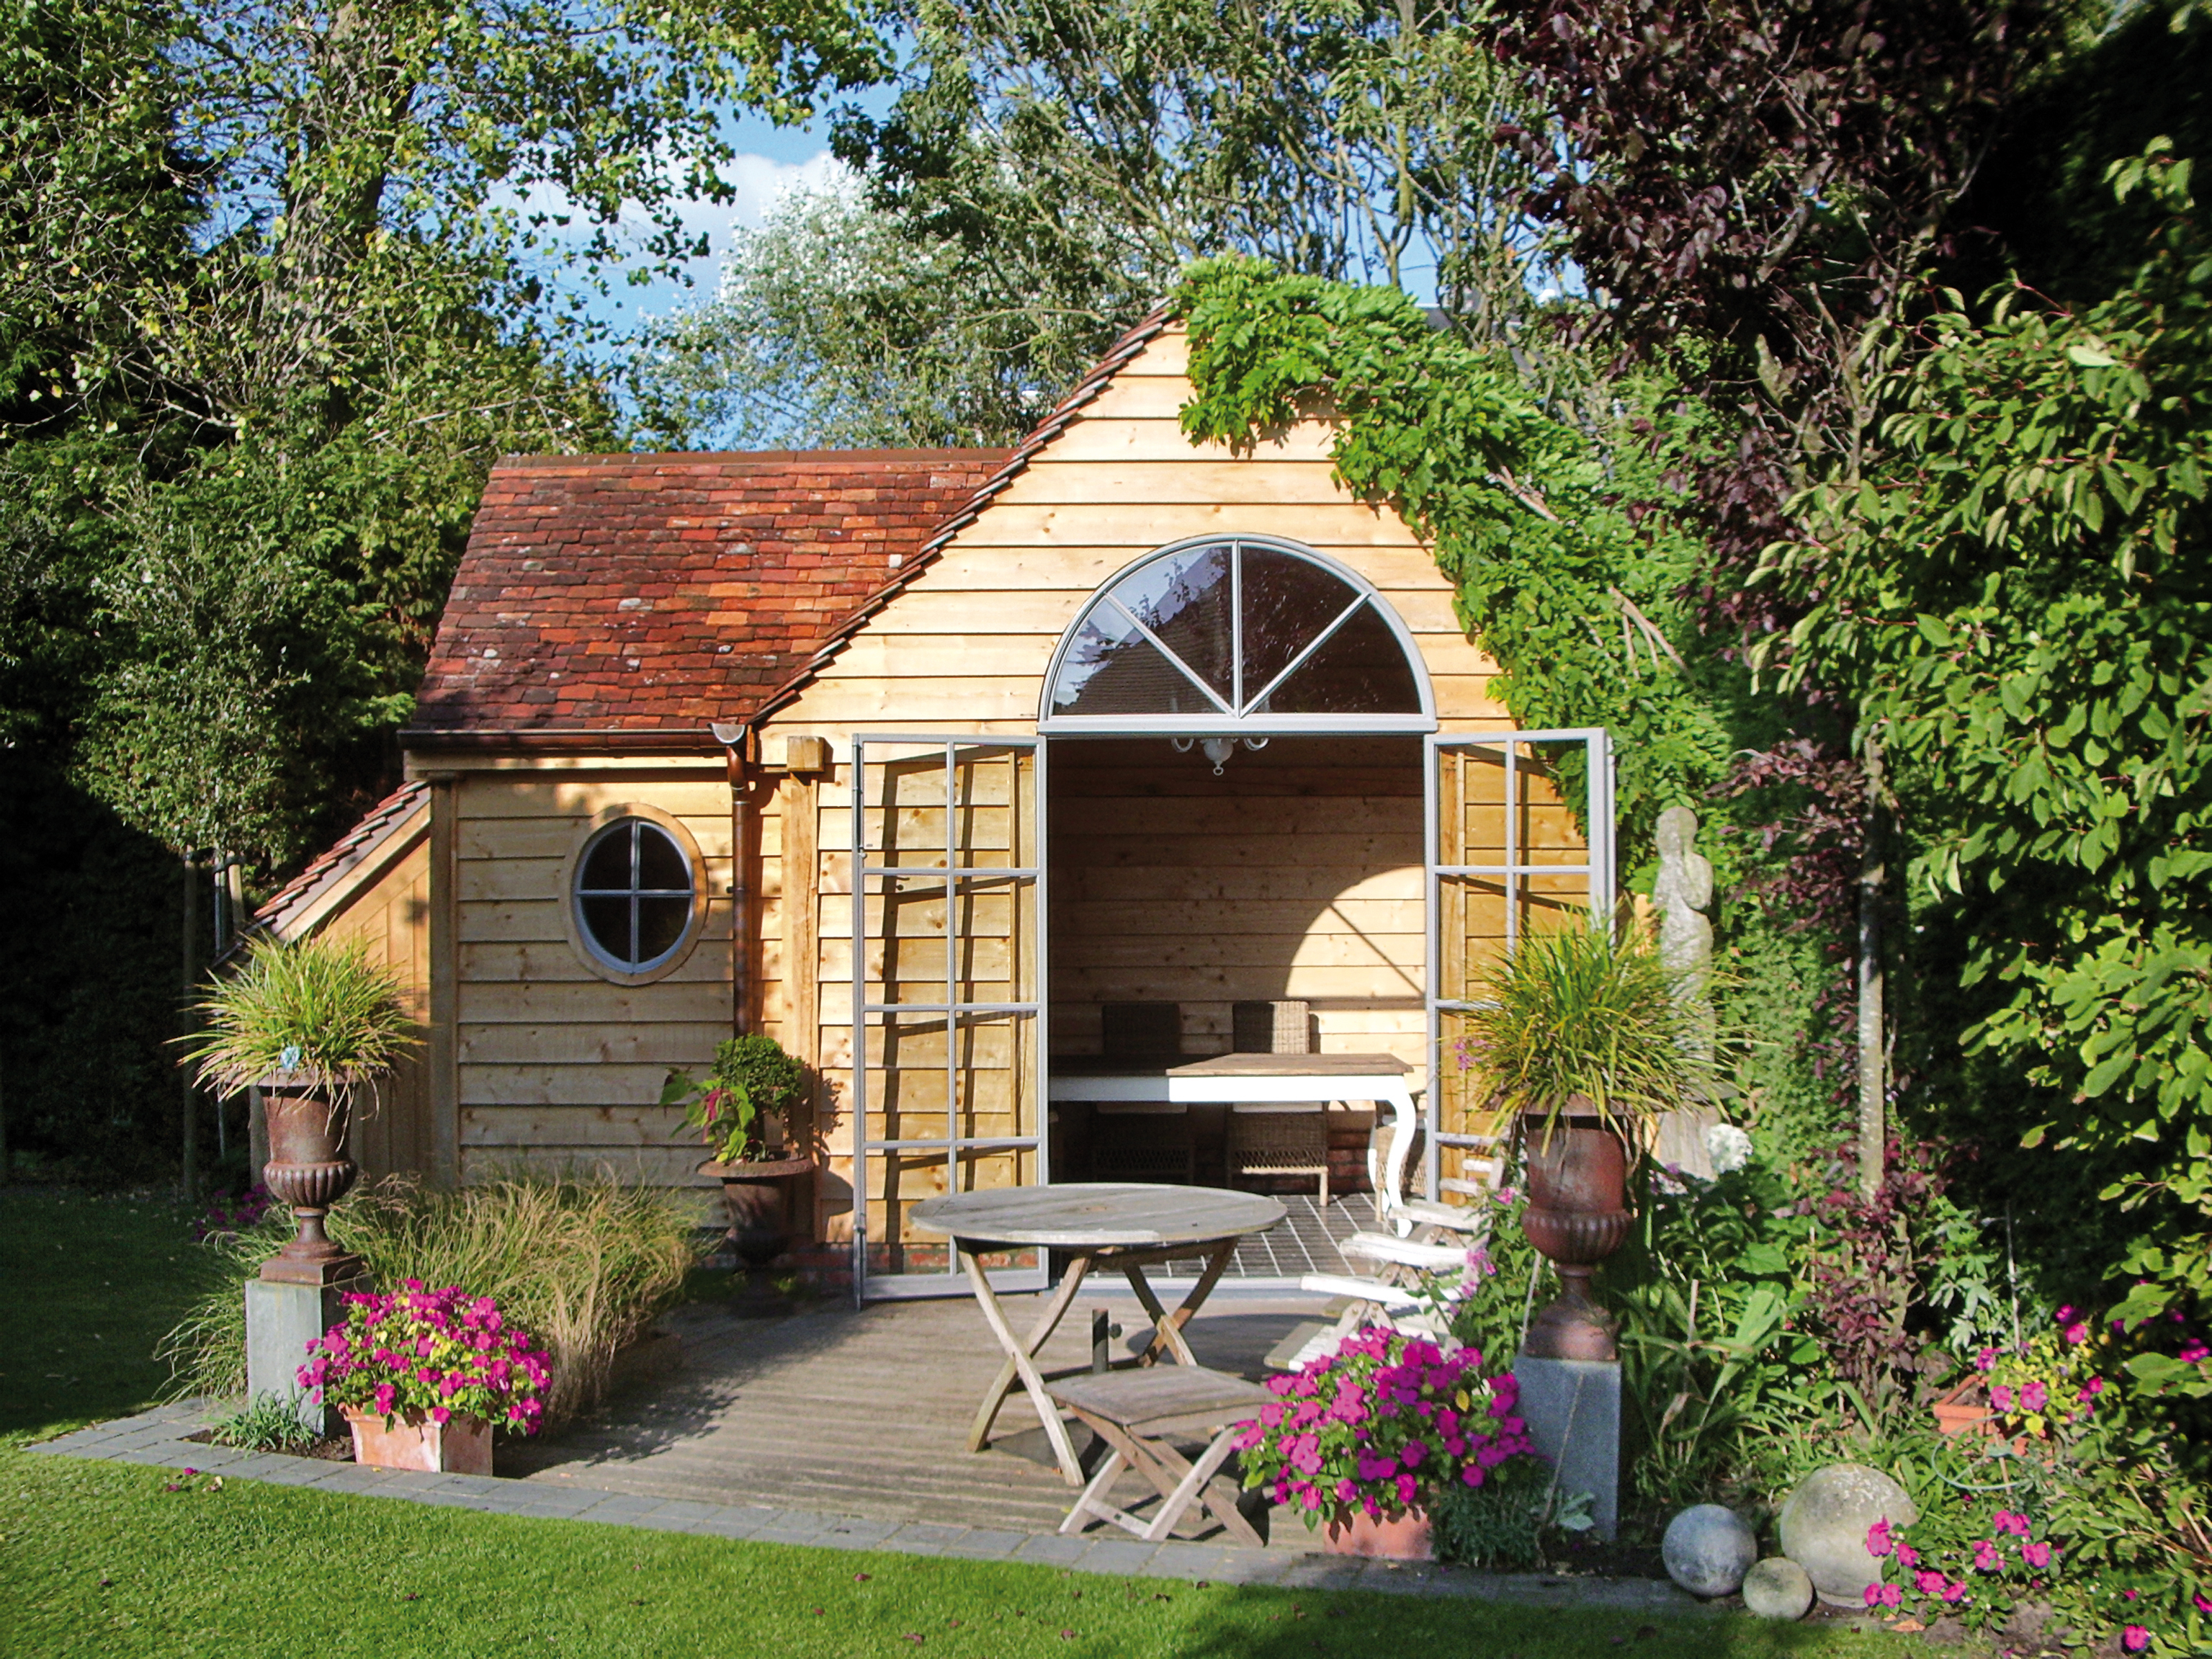 Expert Guide To Adding A Garden Room